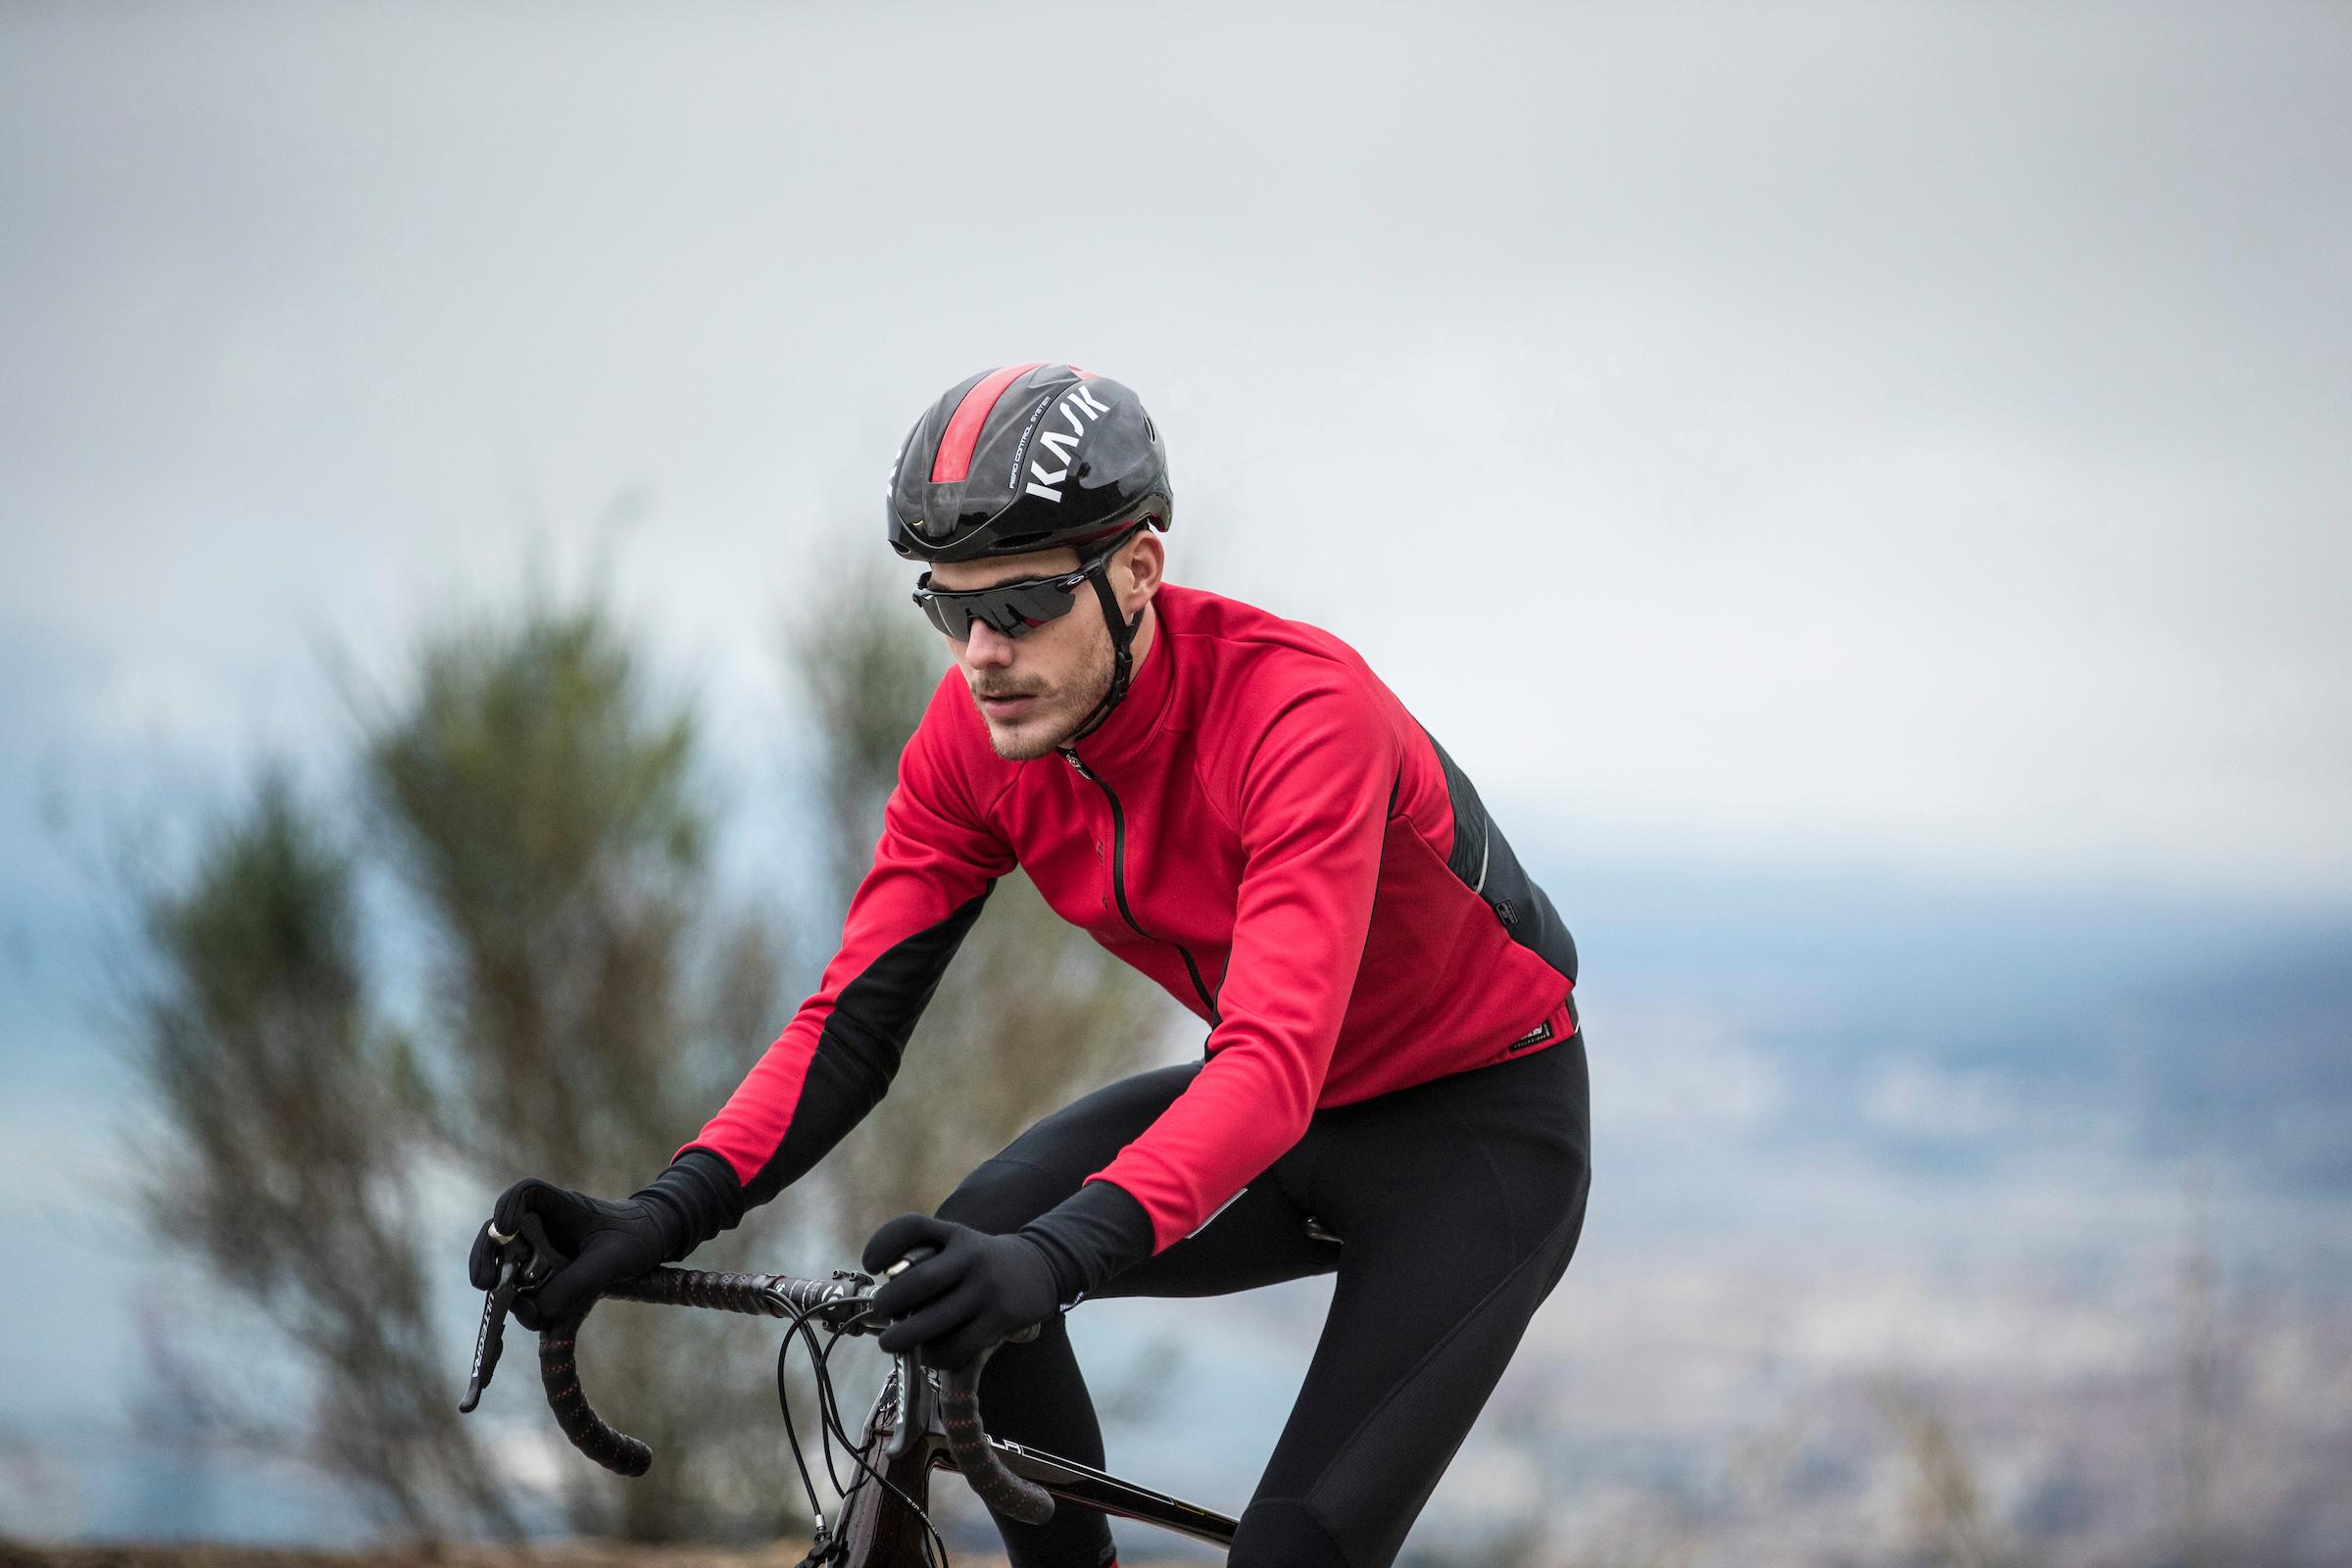 Ropa Ciclismo Santini: Cómo hacer un kit profesional